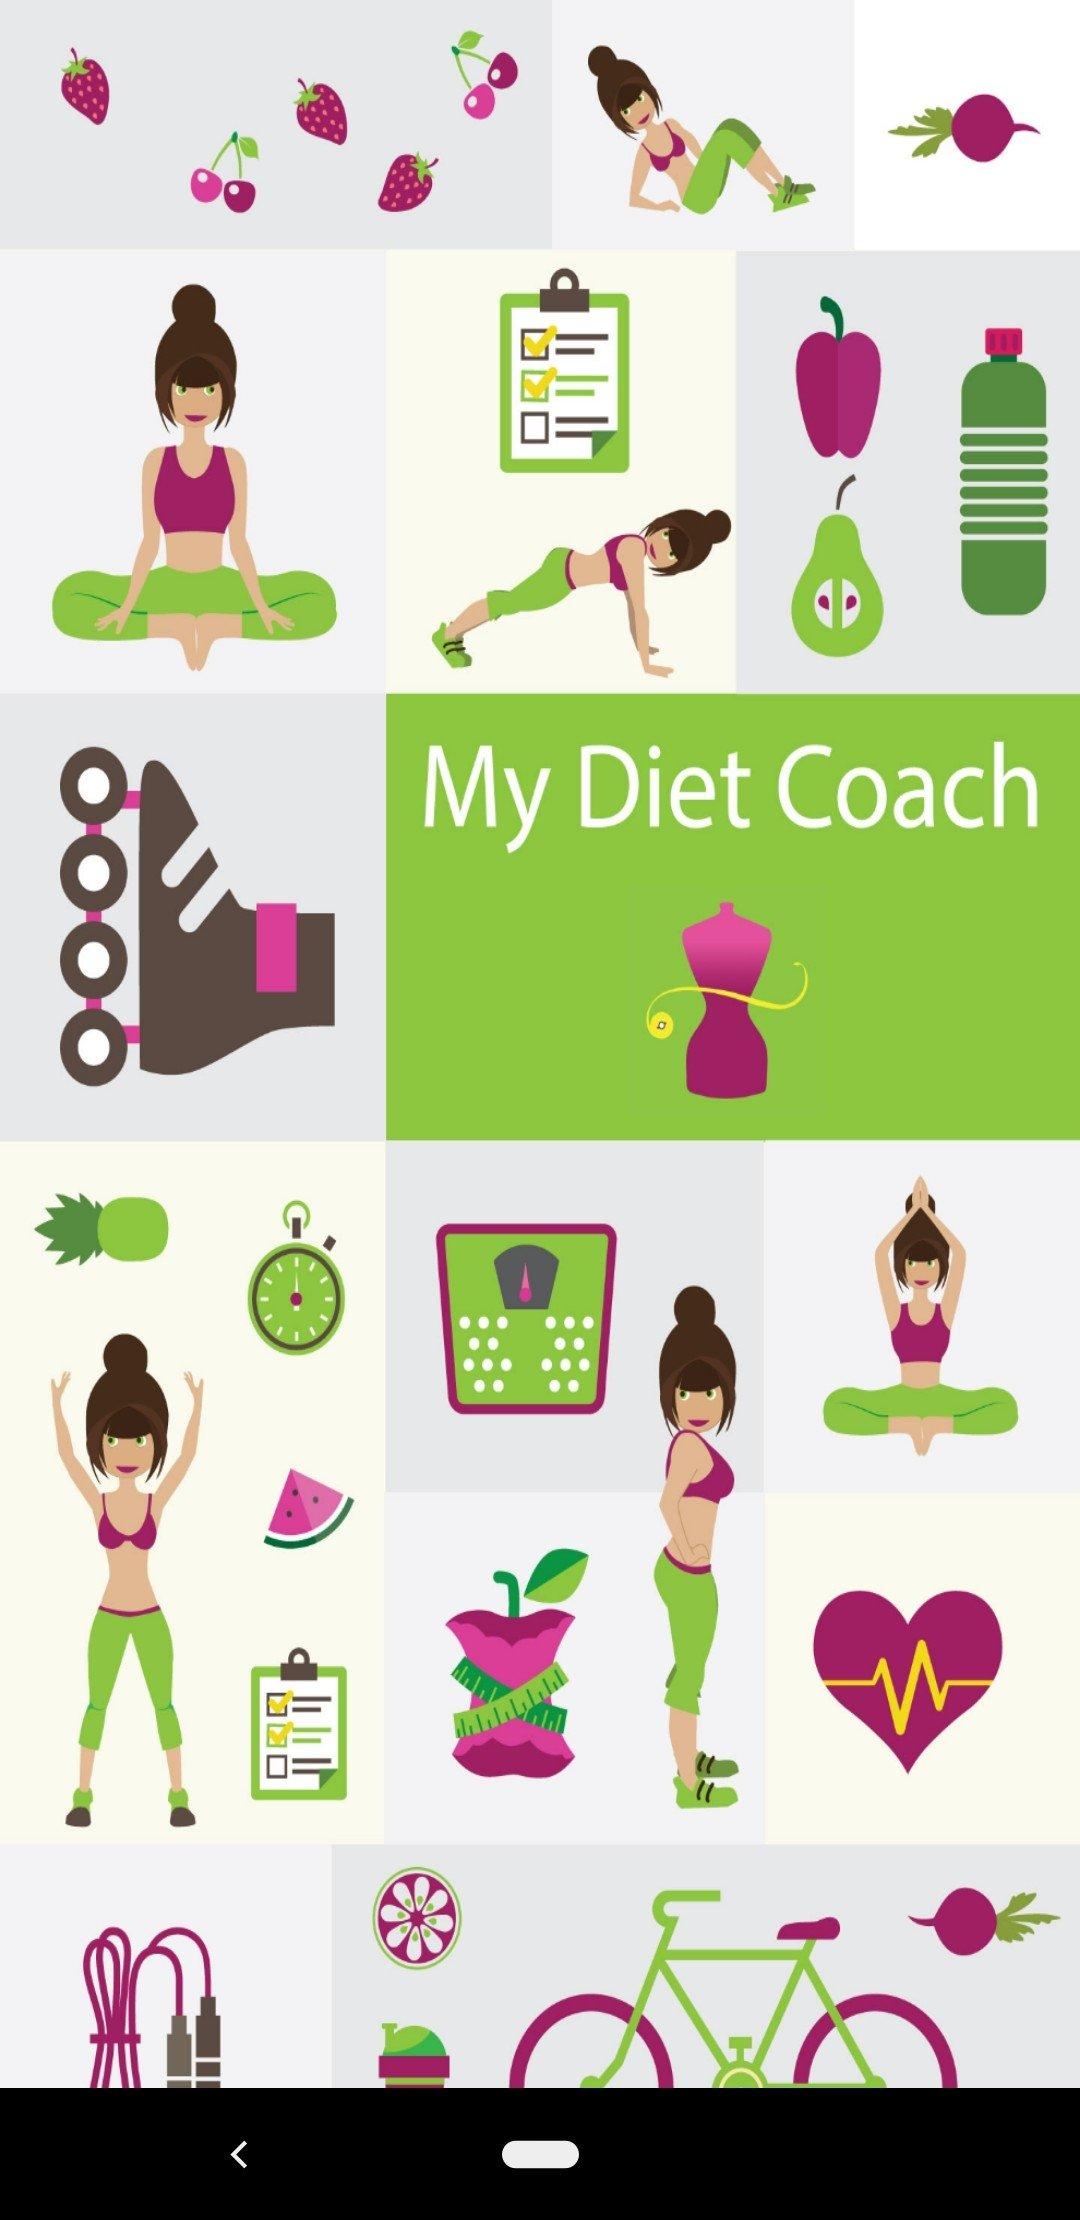 Mon Coach Minceur Android image 7